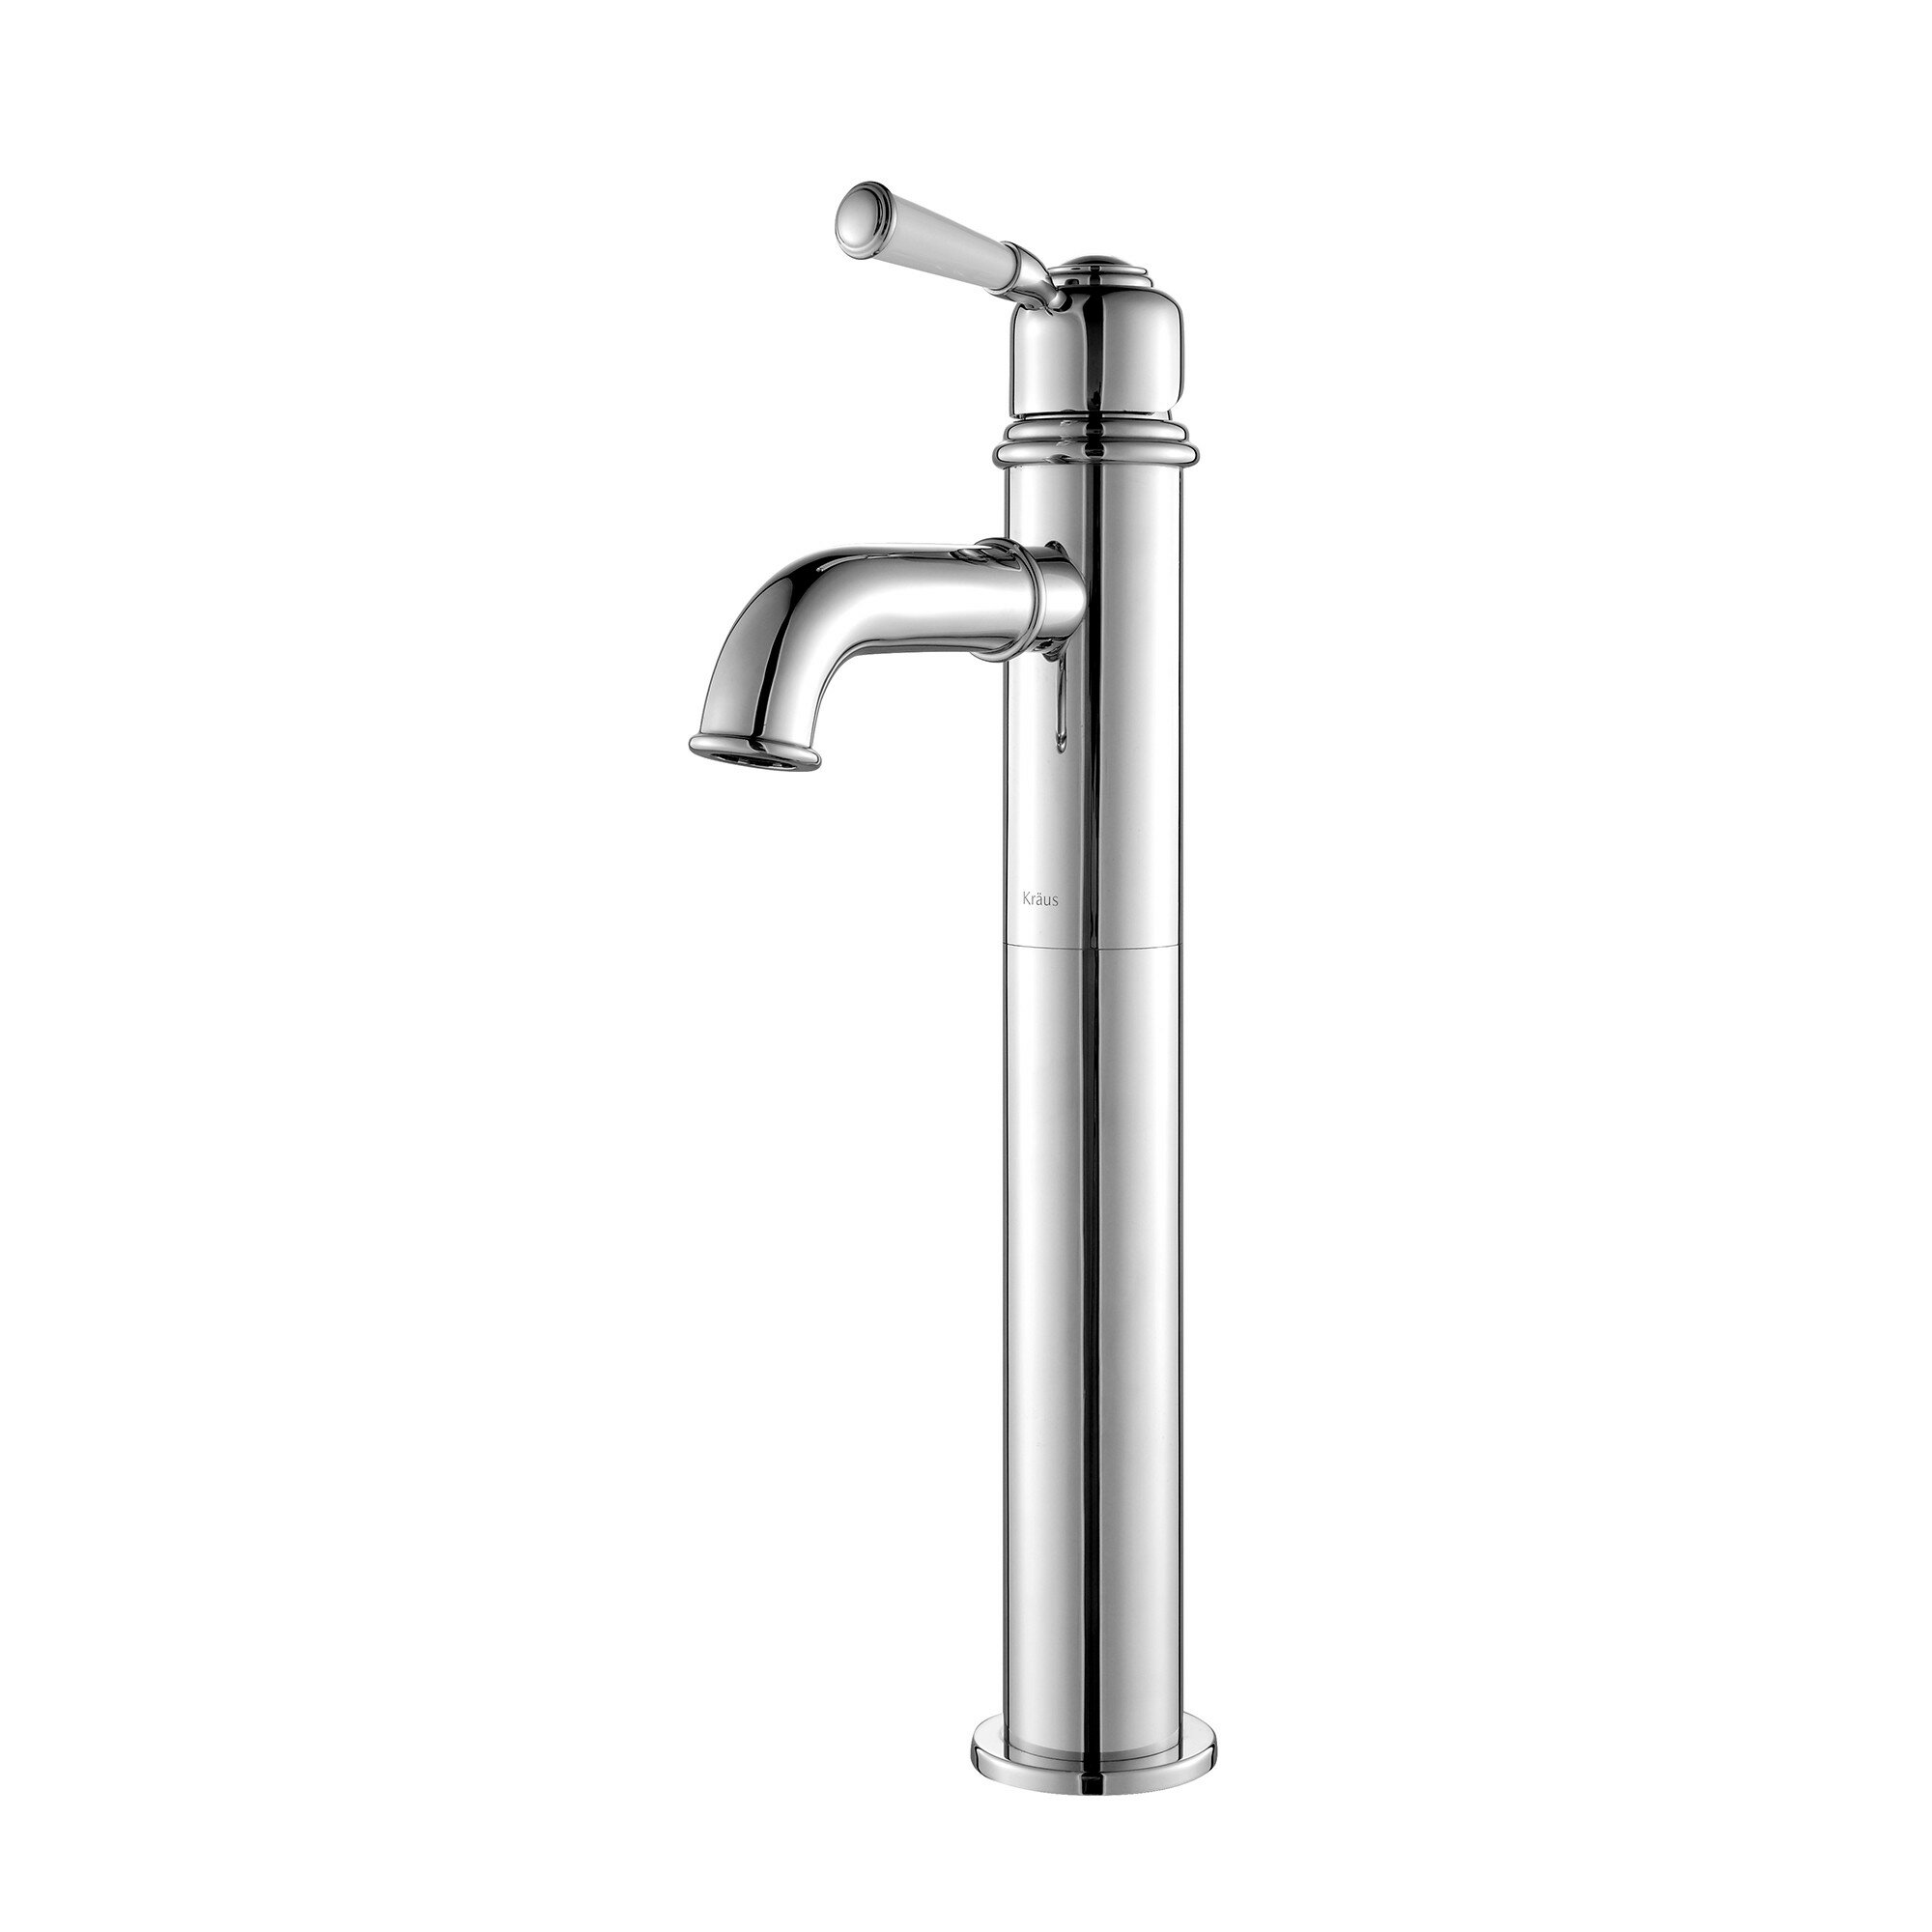 Kraus Exquisite Solinder Single Handle Vessel Bathroom Faucet ...